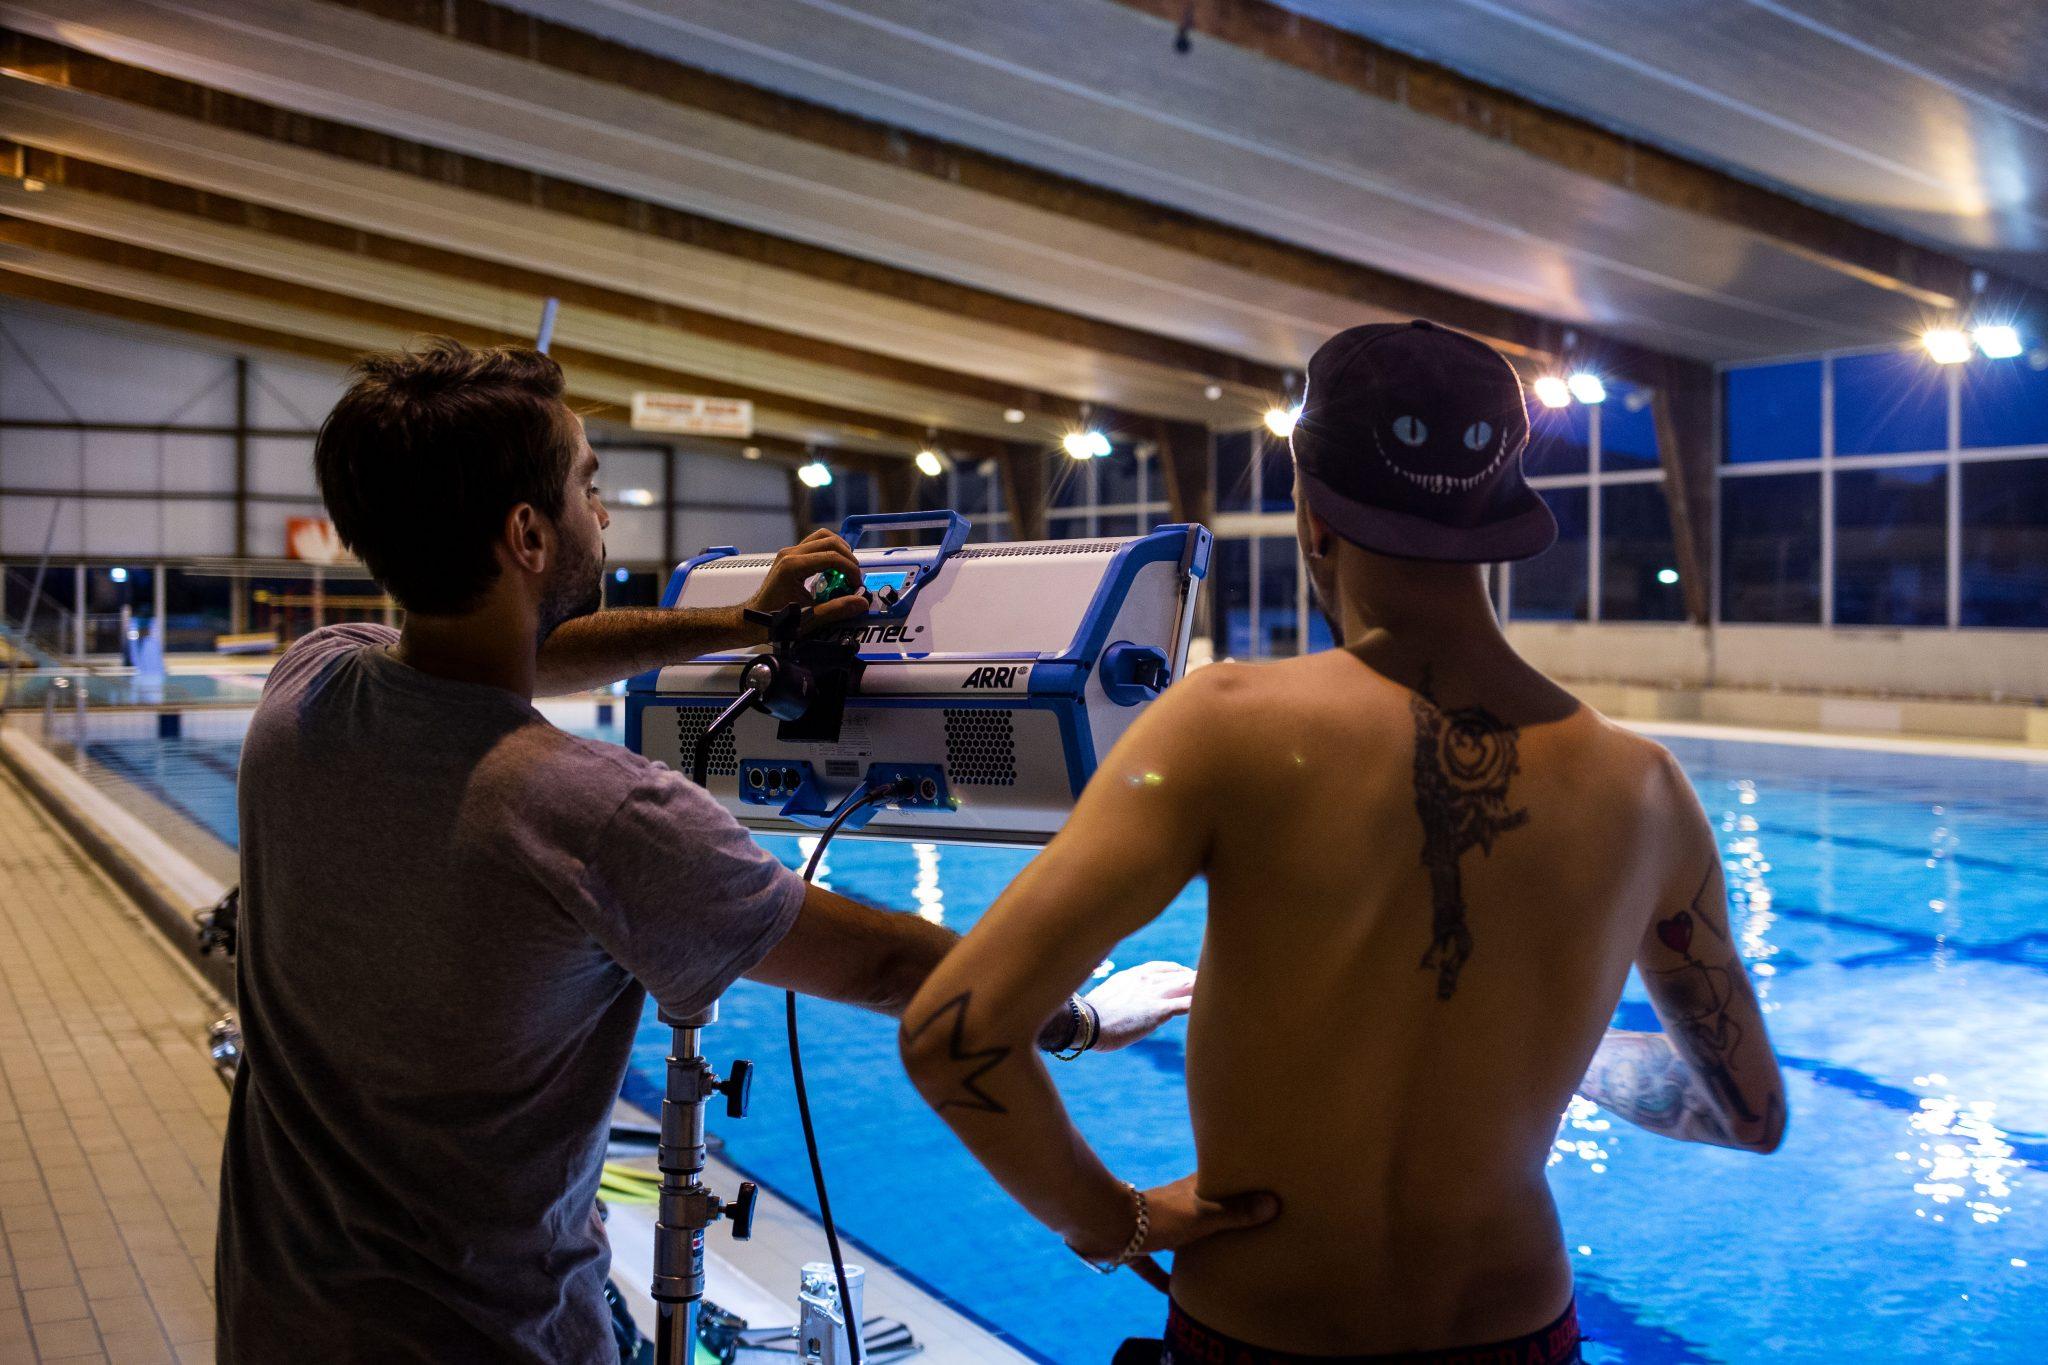 tournage ultraviolet reasons